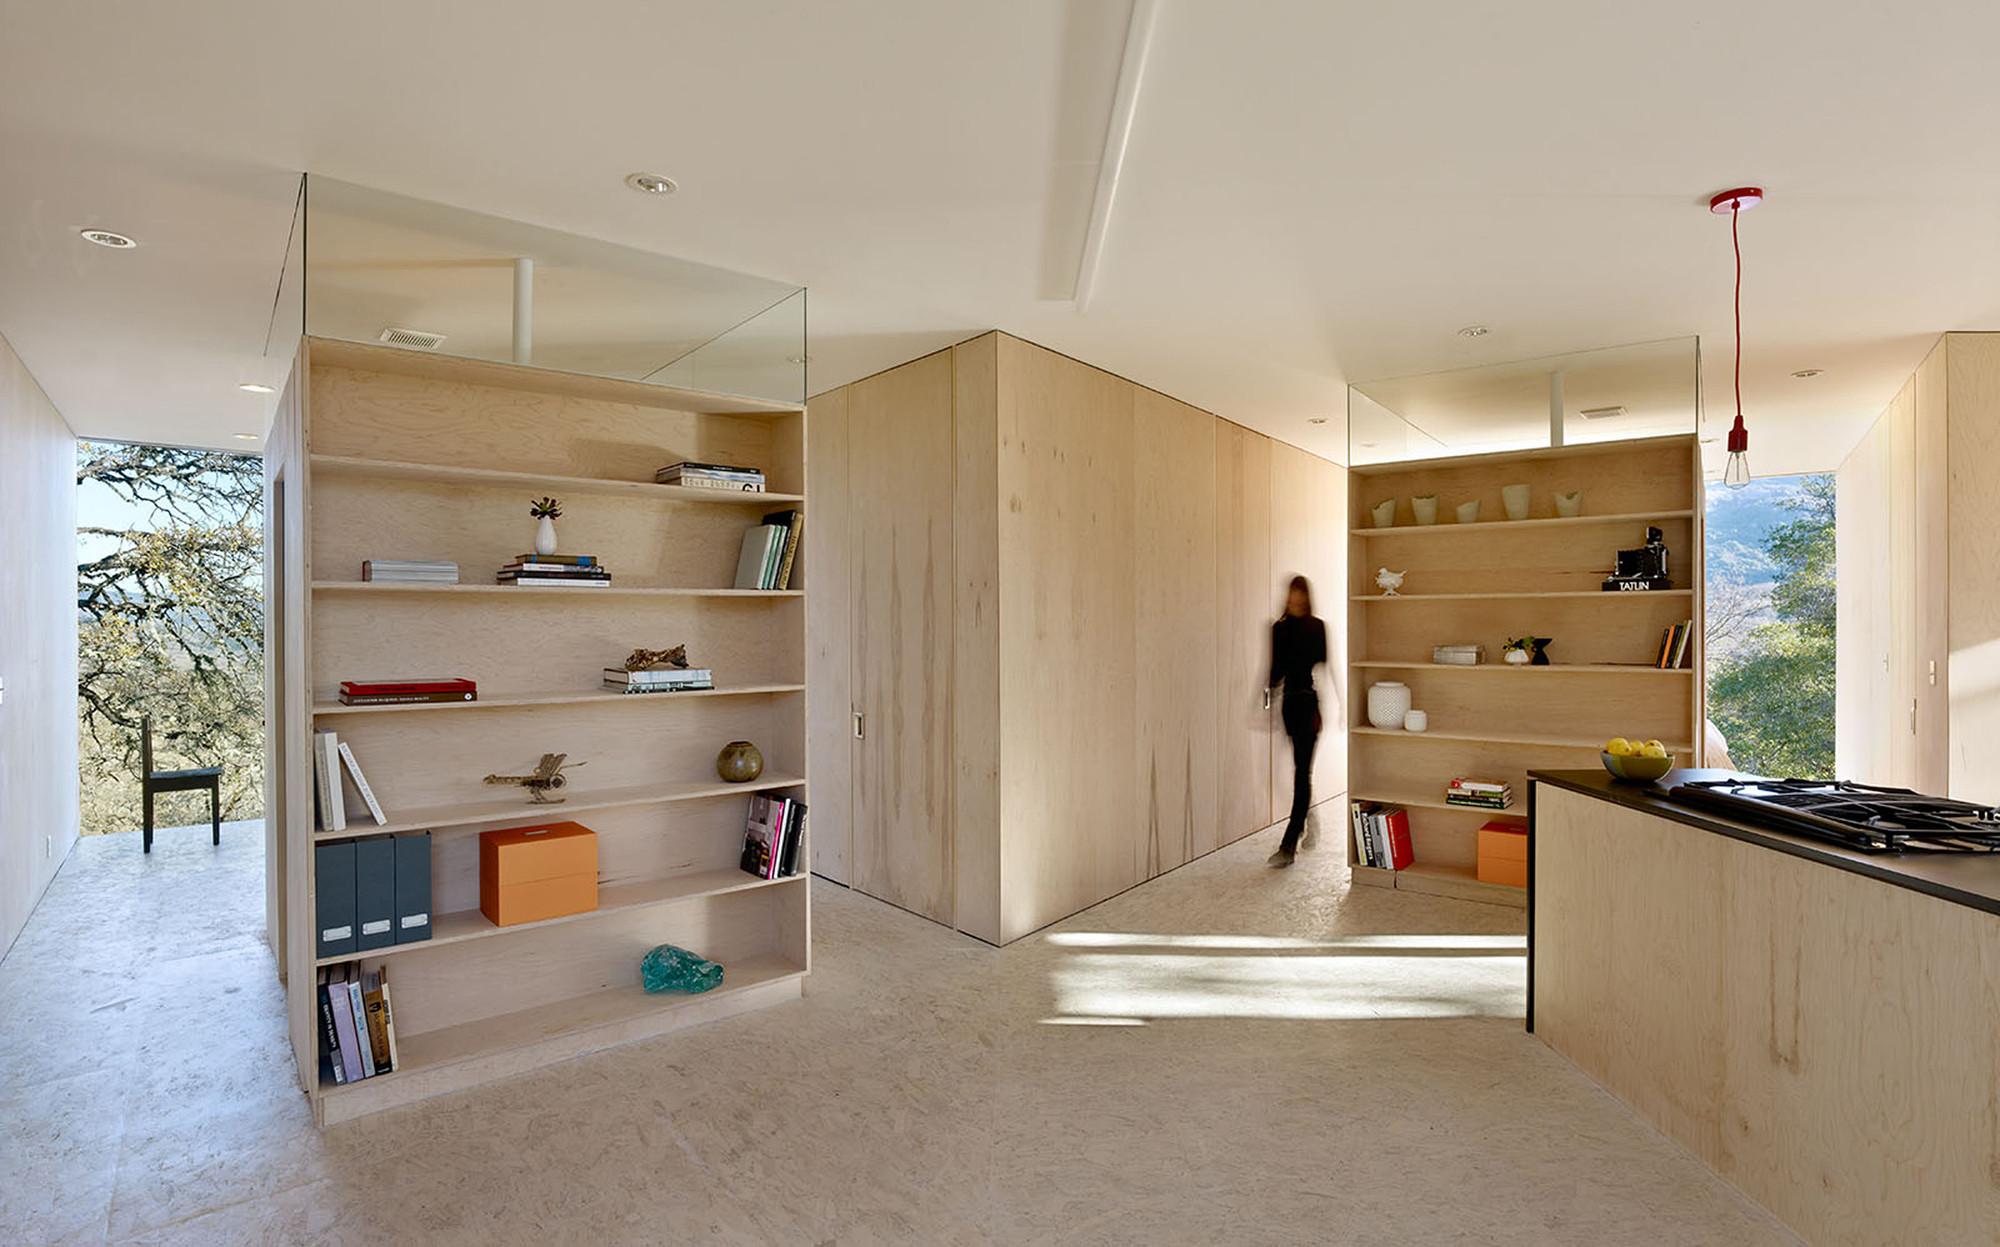 Casa en la Calle Moose / Mork-Ulnes Architects . Image © Bruce Damonte